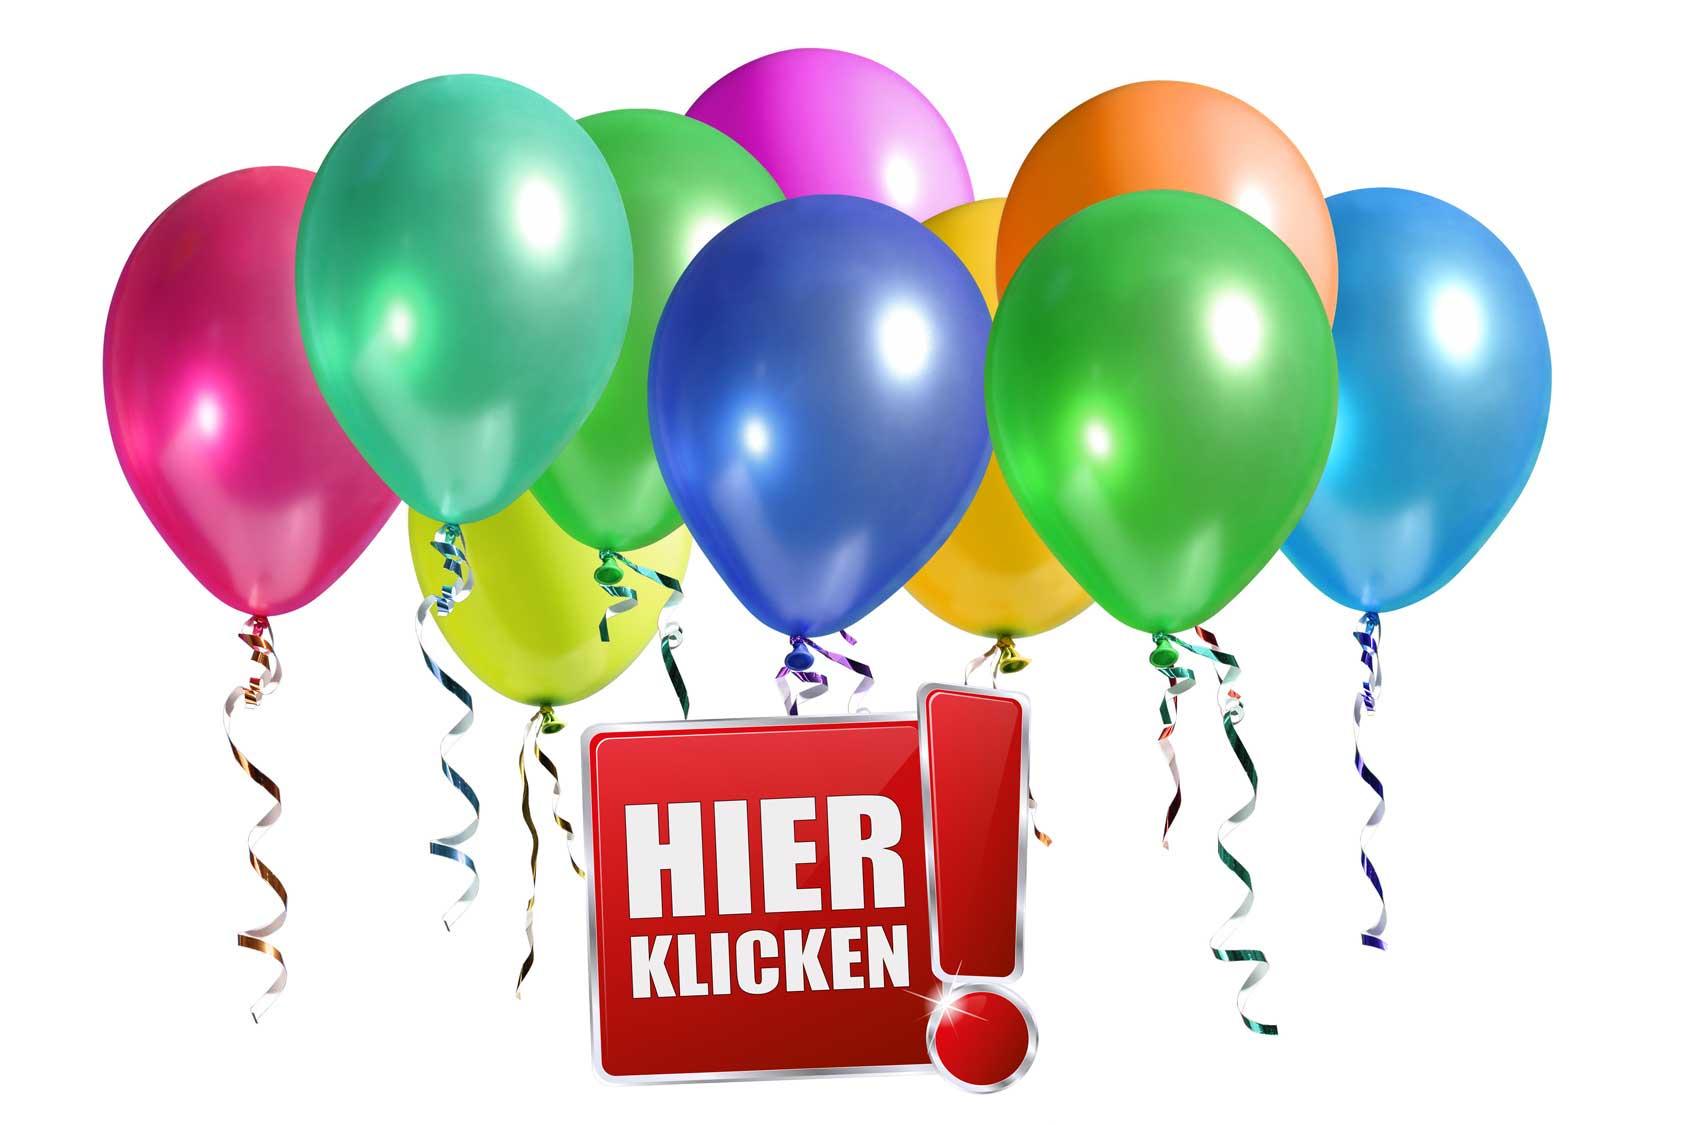 luftballons f r party und event in oberhausen. Black Bedroom Furniture Sets. Home Design Ideas